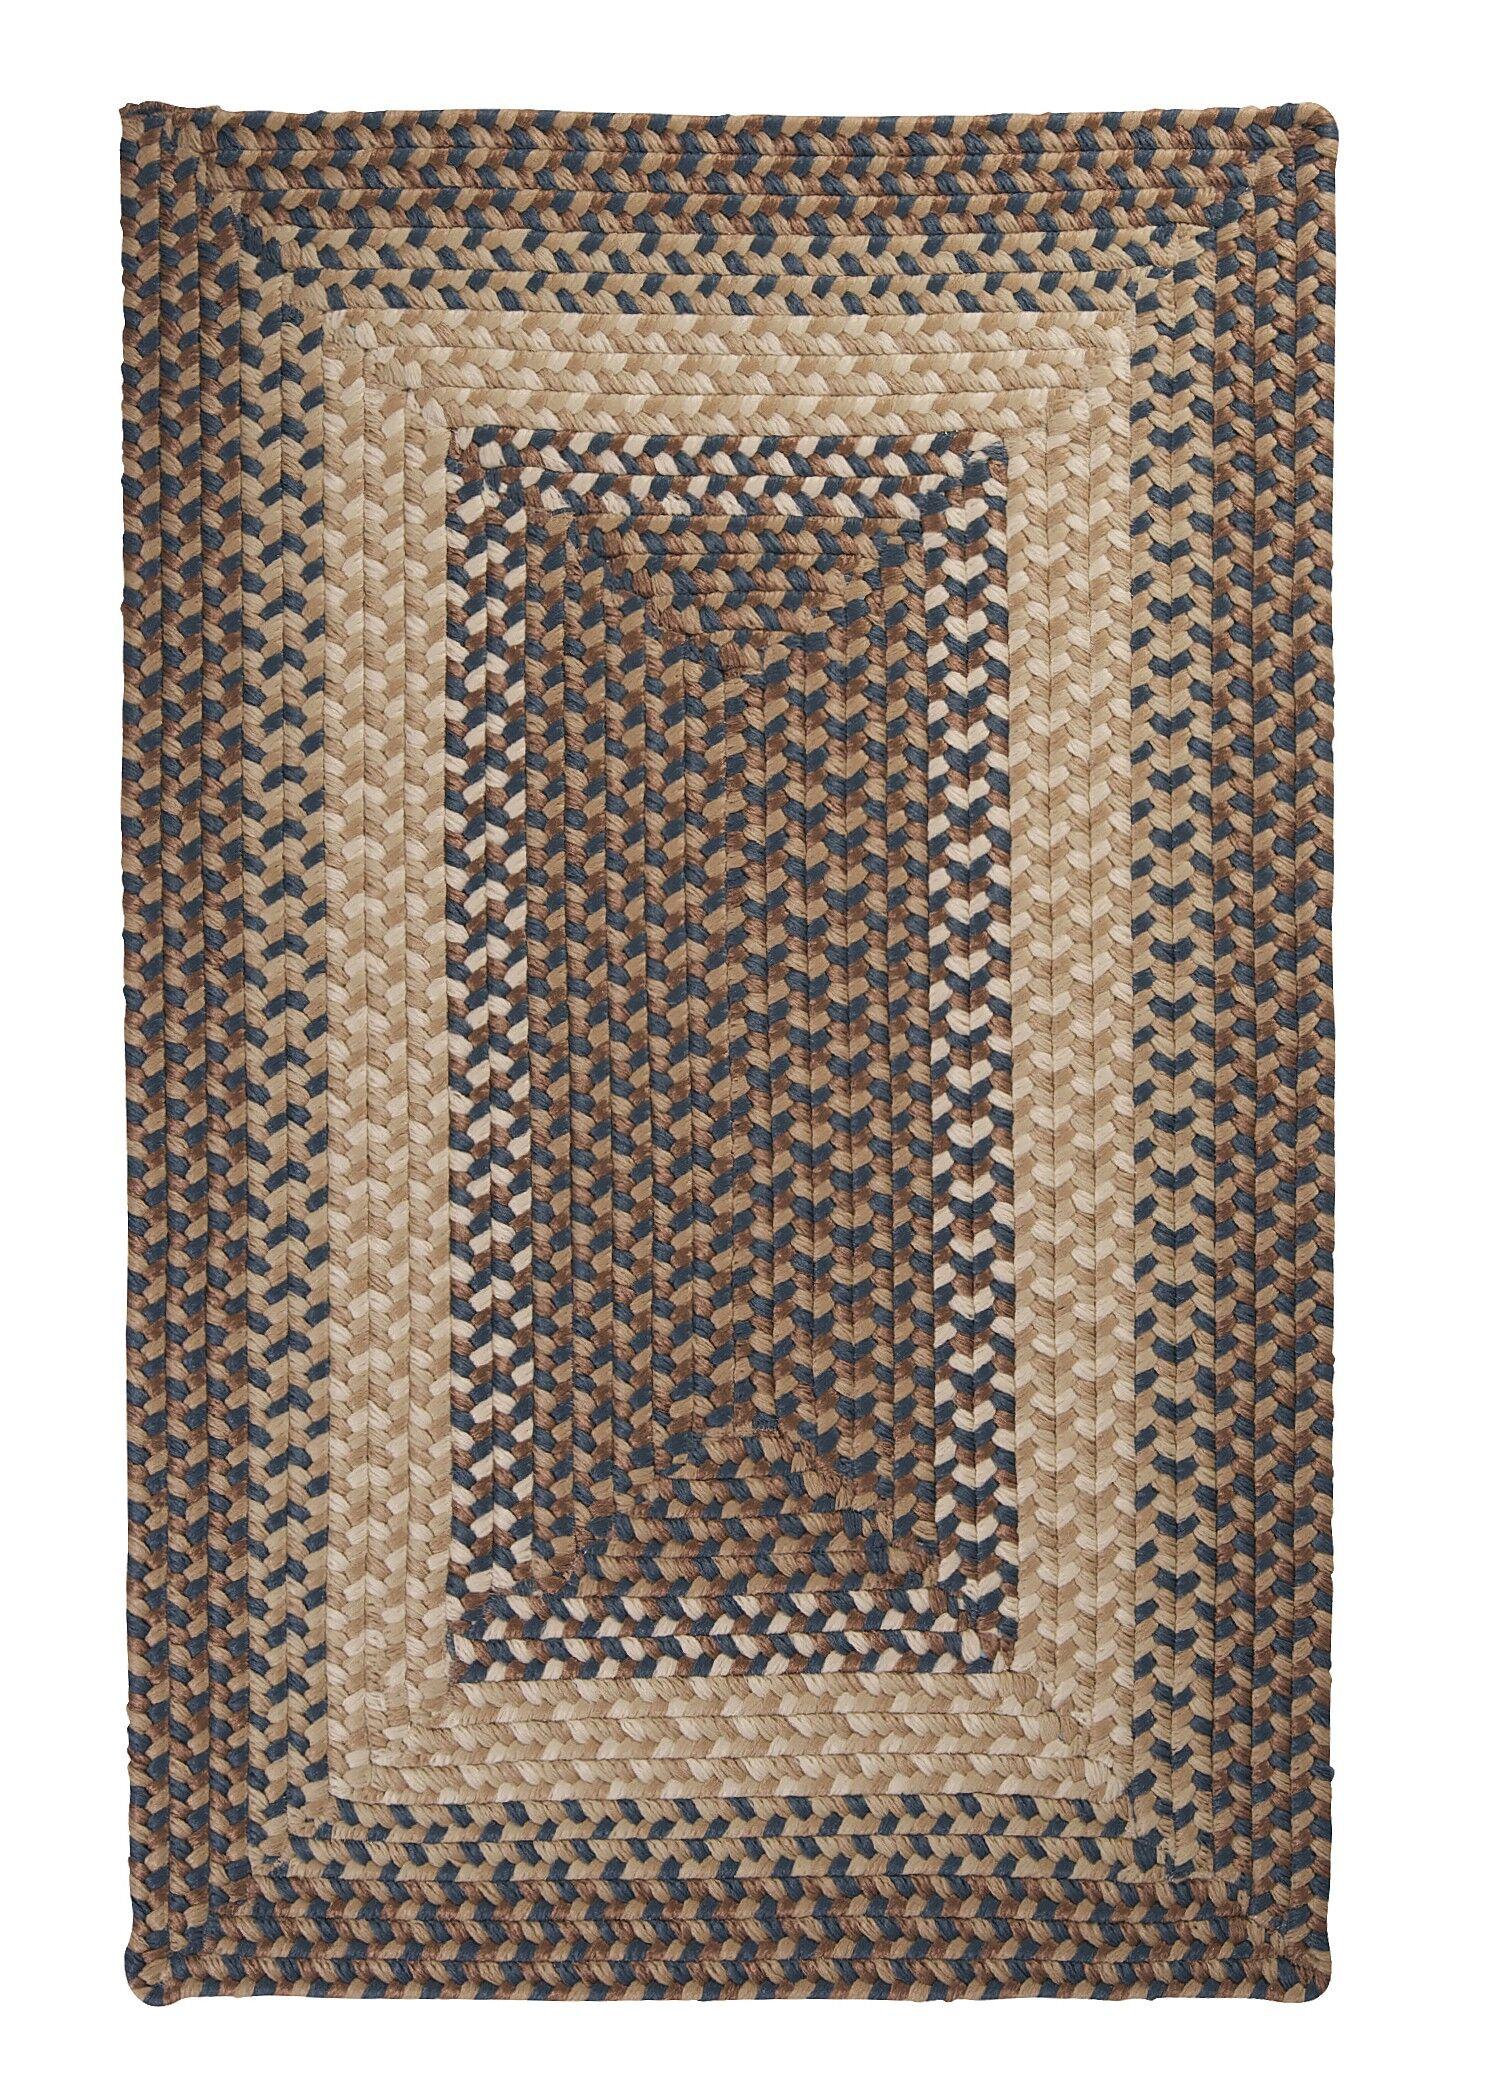 Tiburon Stone & Blue Braided Indoor/Outdoor Area Rug Rug Size: Rectangle 7' x 9'